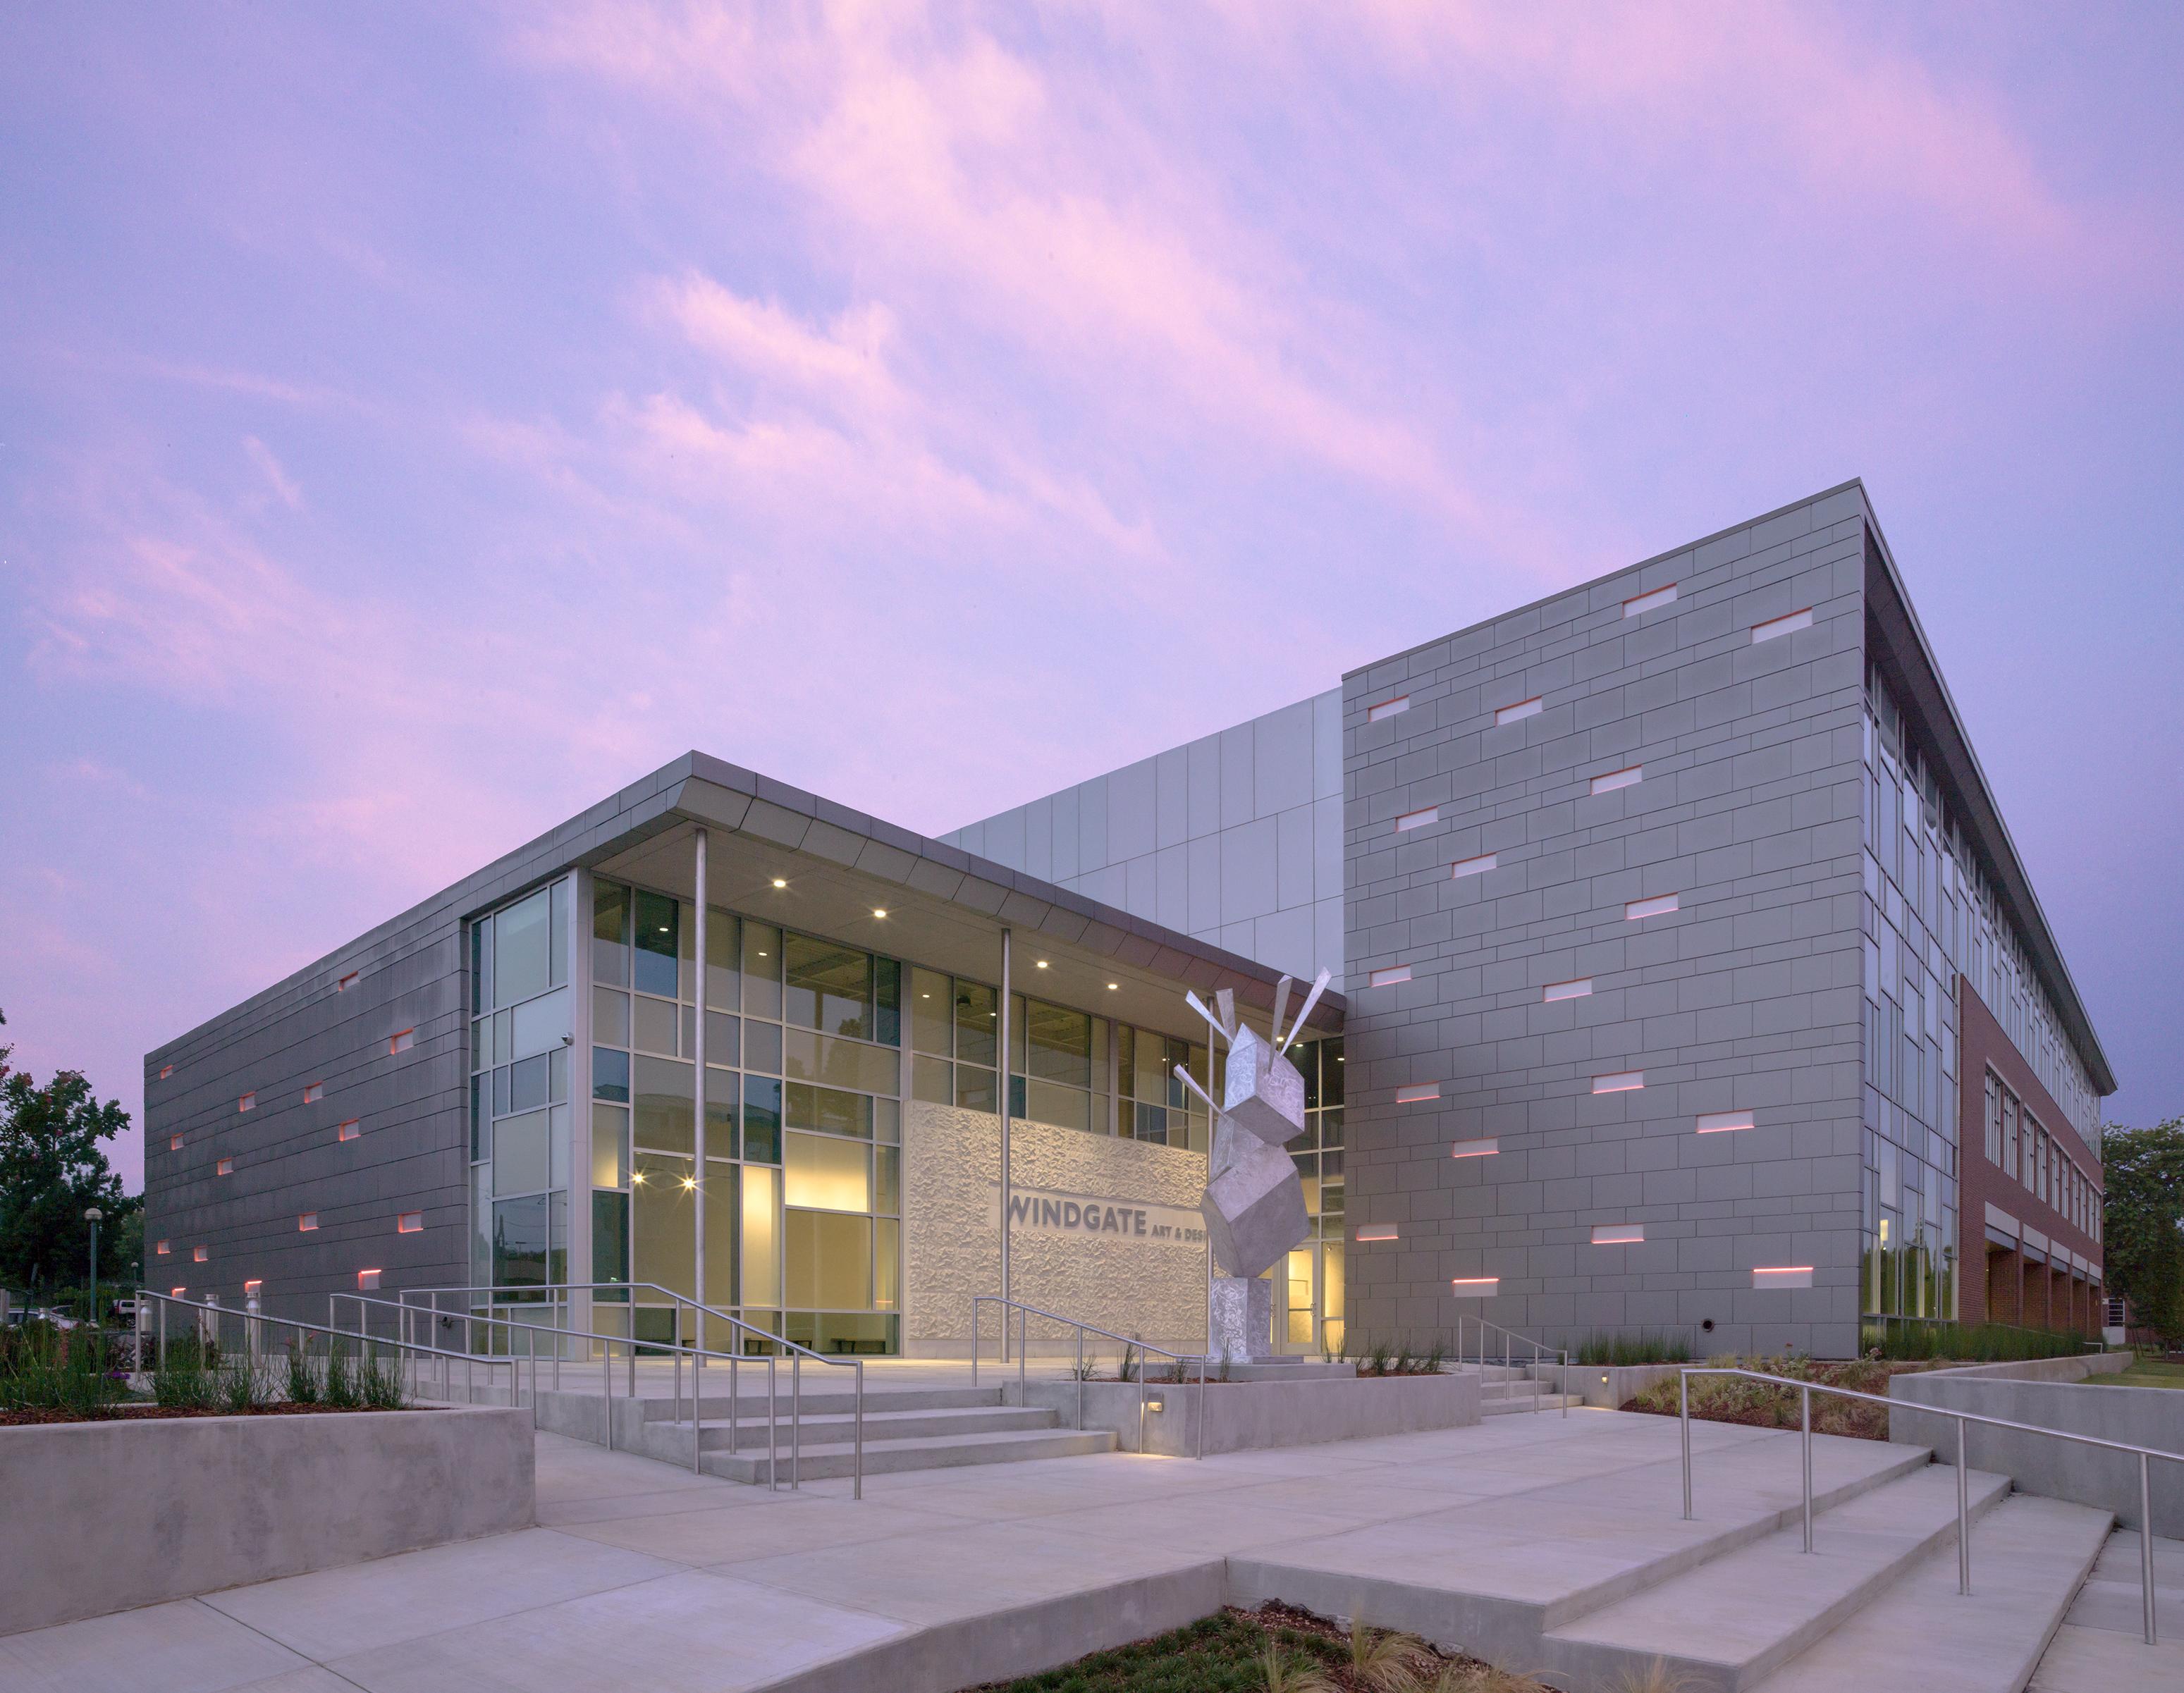 Windgate Art & Design Building